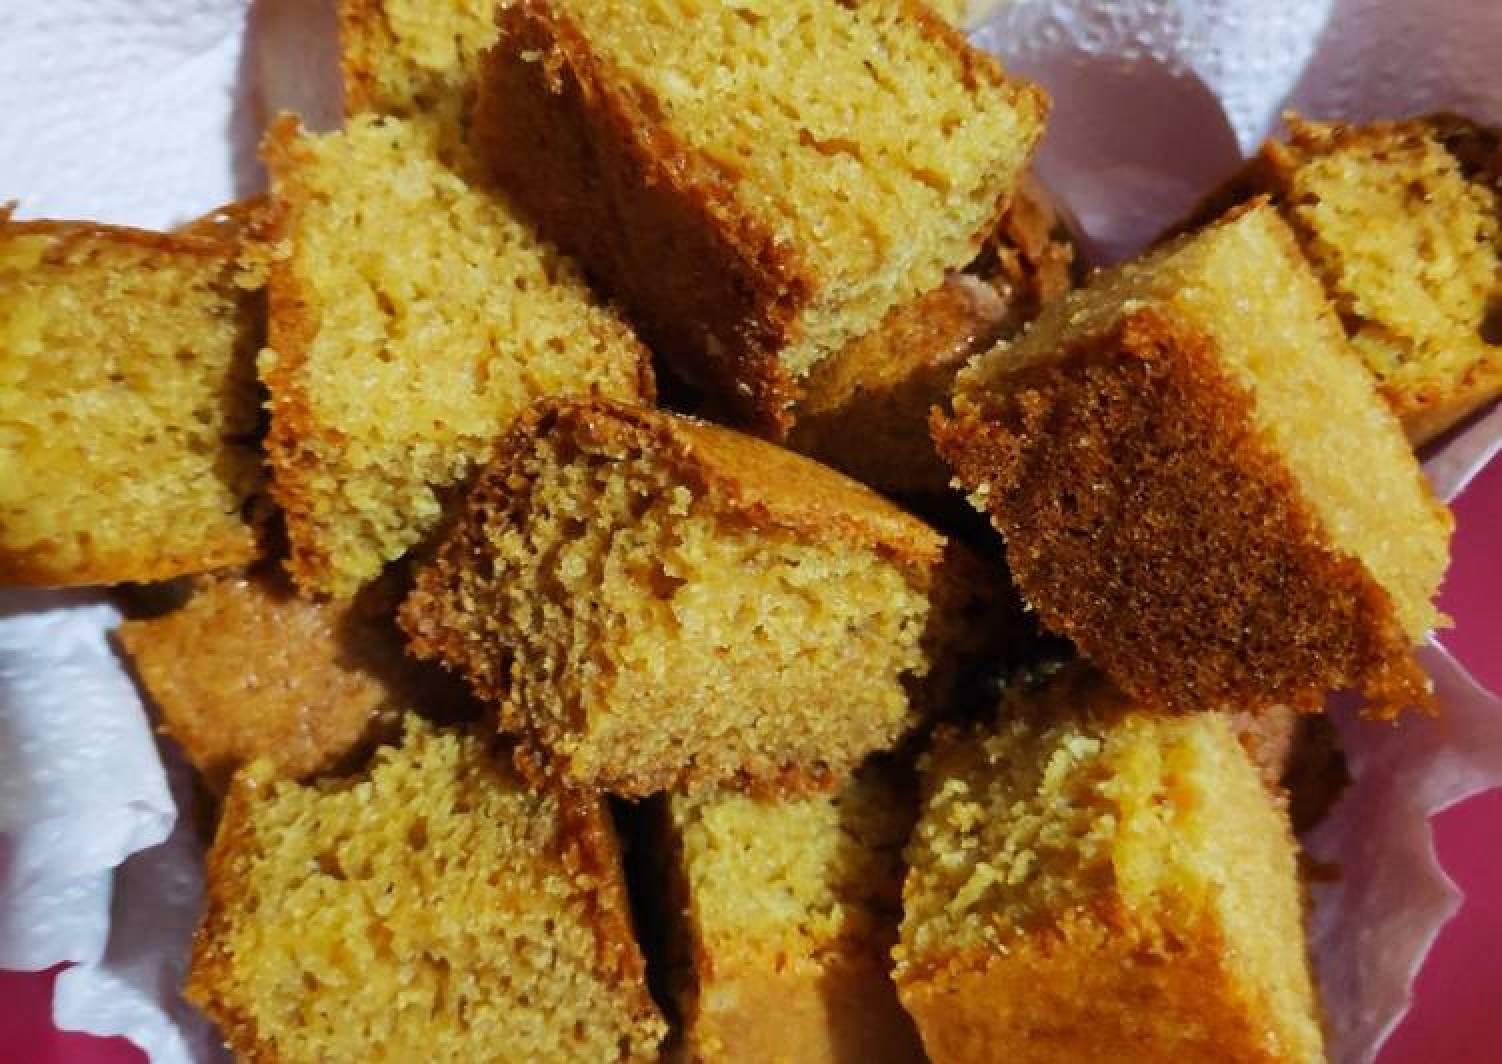 Wheat flour sponge cake